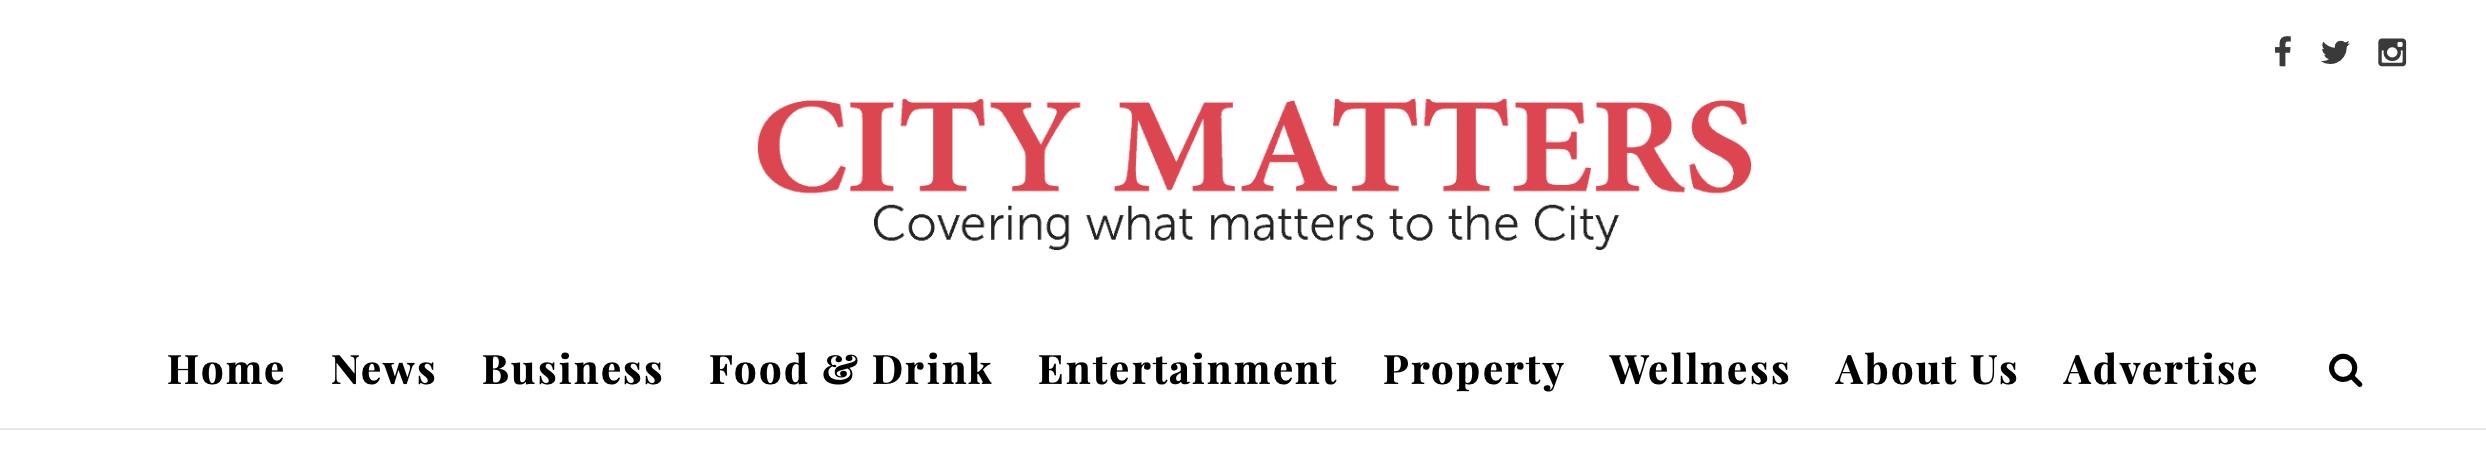 City Matters - May 2019